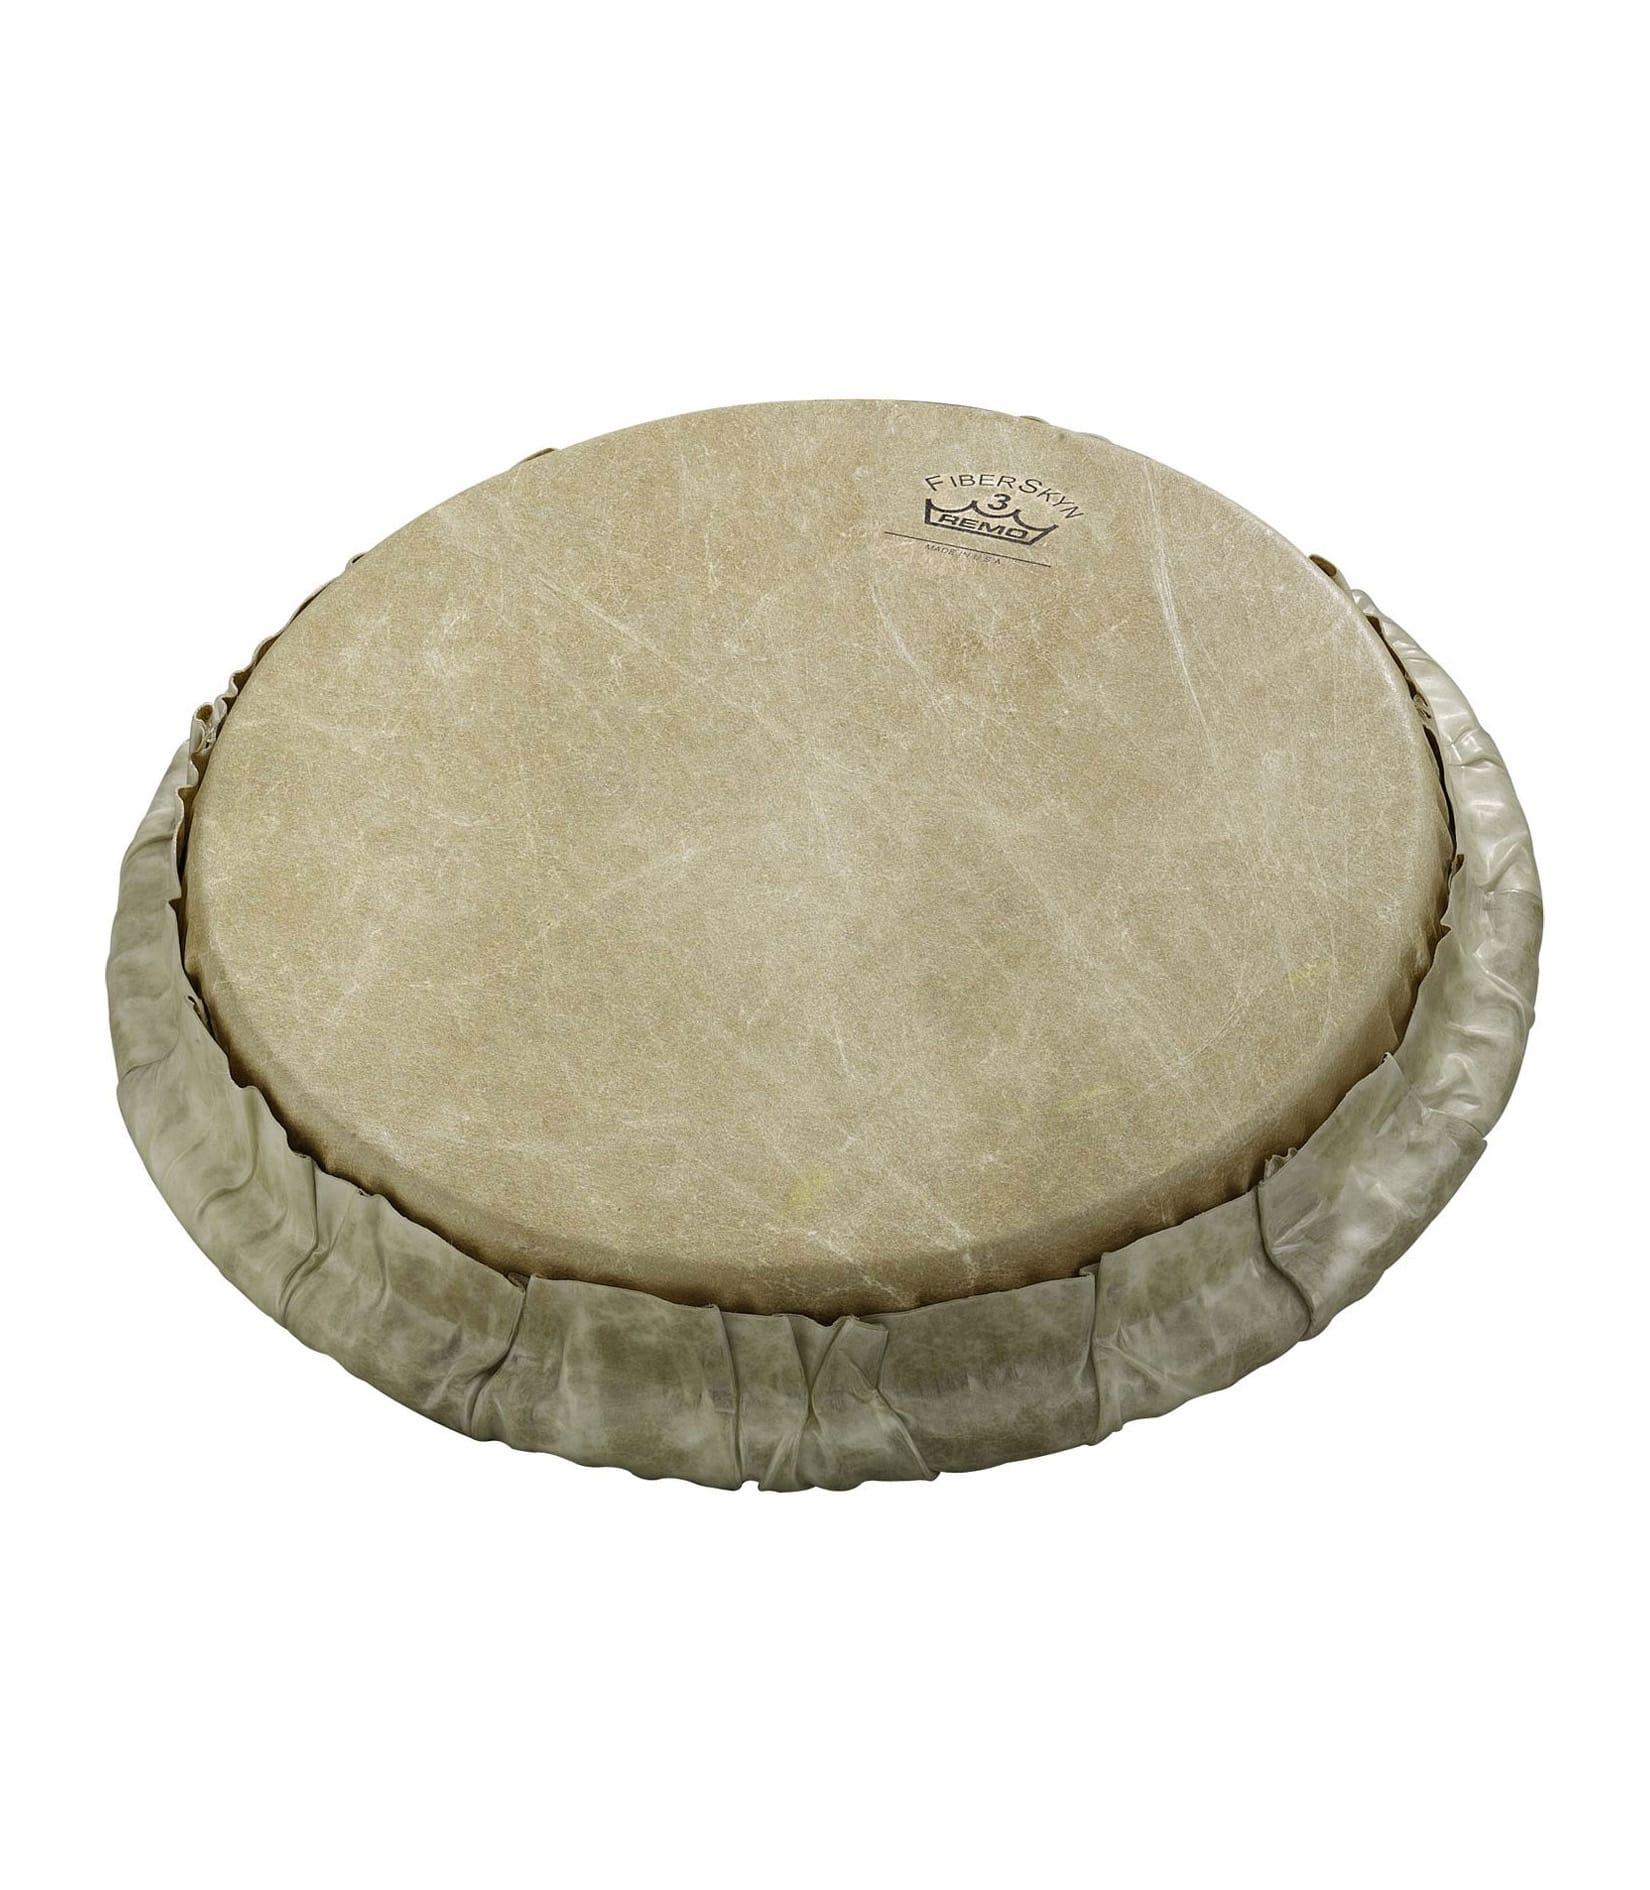 Buy remo Bongo Drumhead Tucked 8 5 FIBERSKYN Melody House